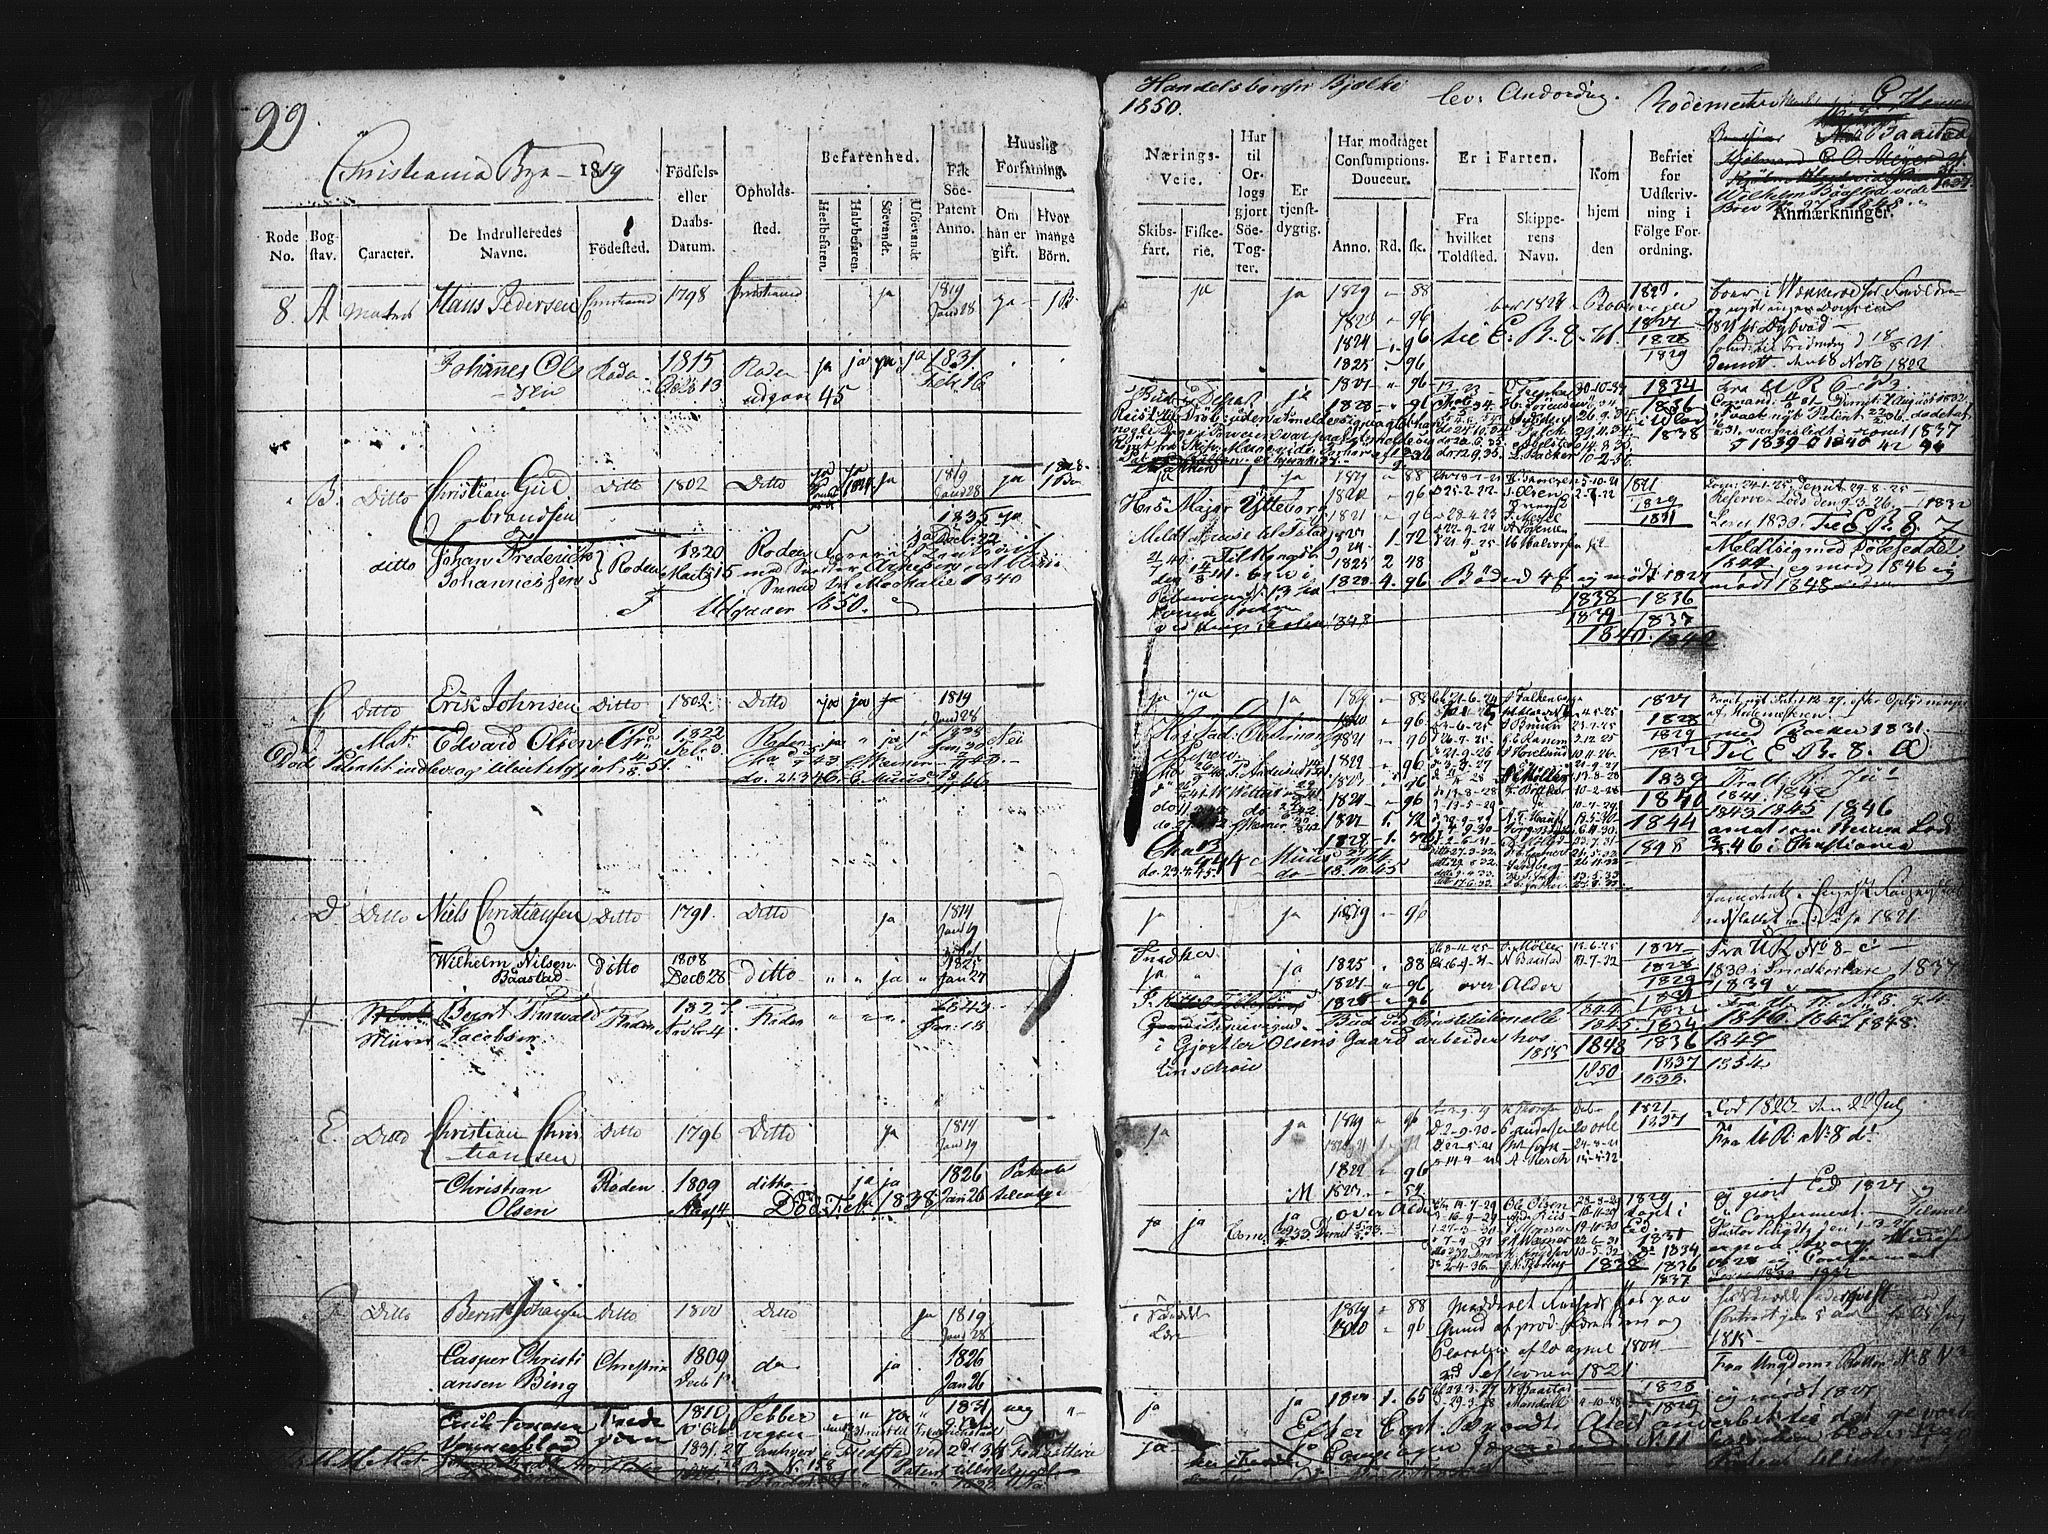 SAO, Oslo mønstringskontor, F/Fc/Fcb/L0001: Hovedrulle, 1819, s. 99